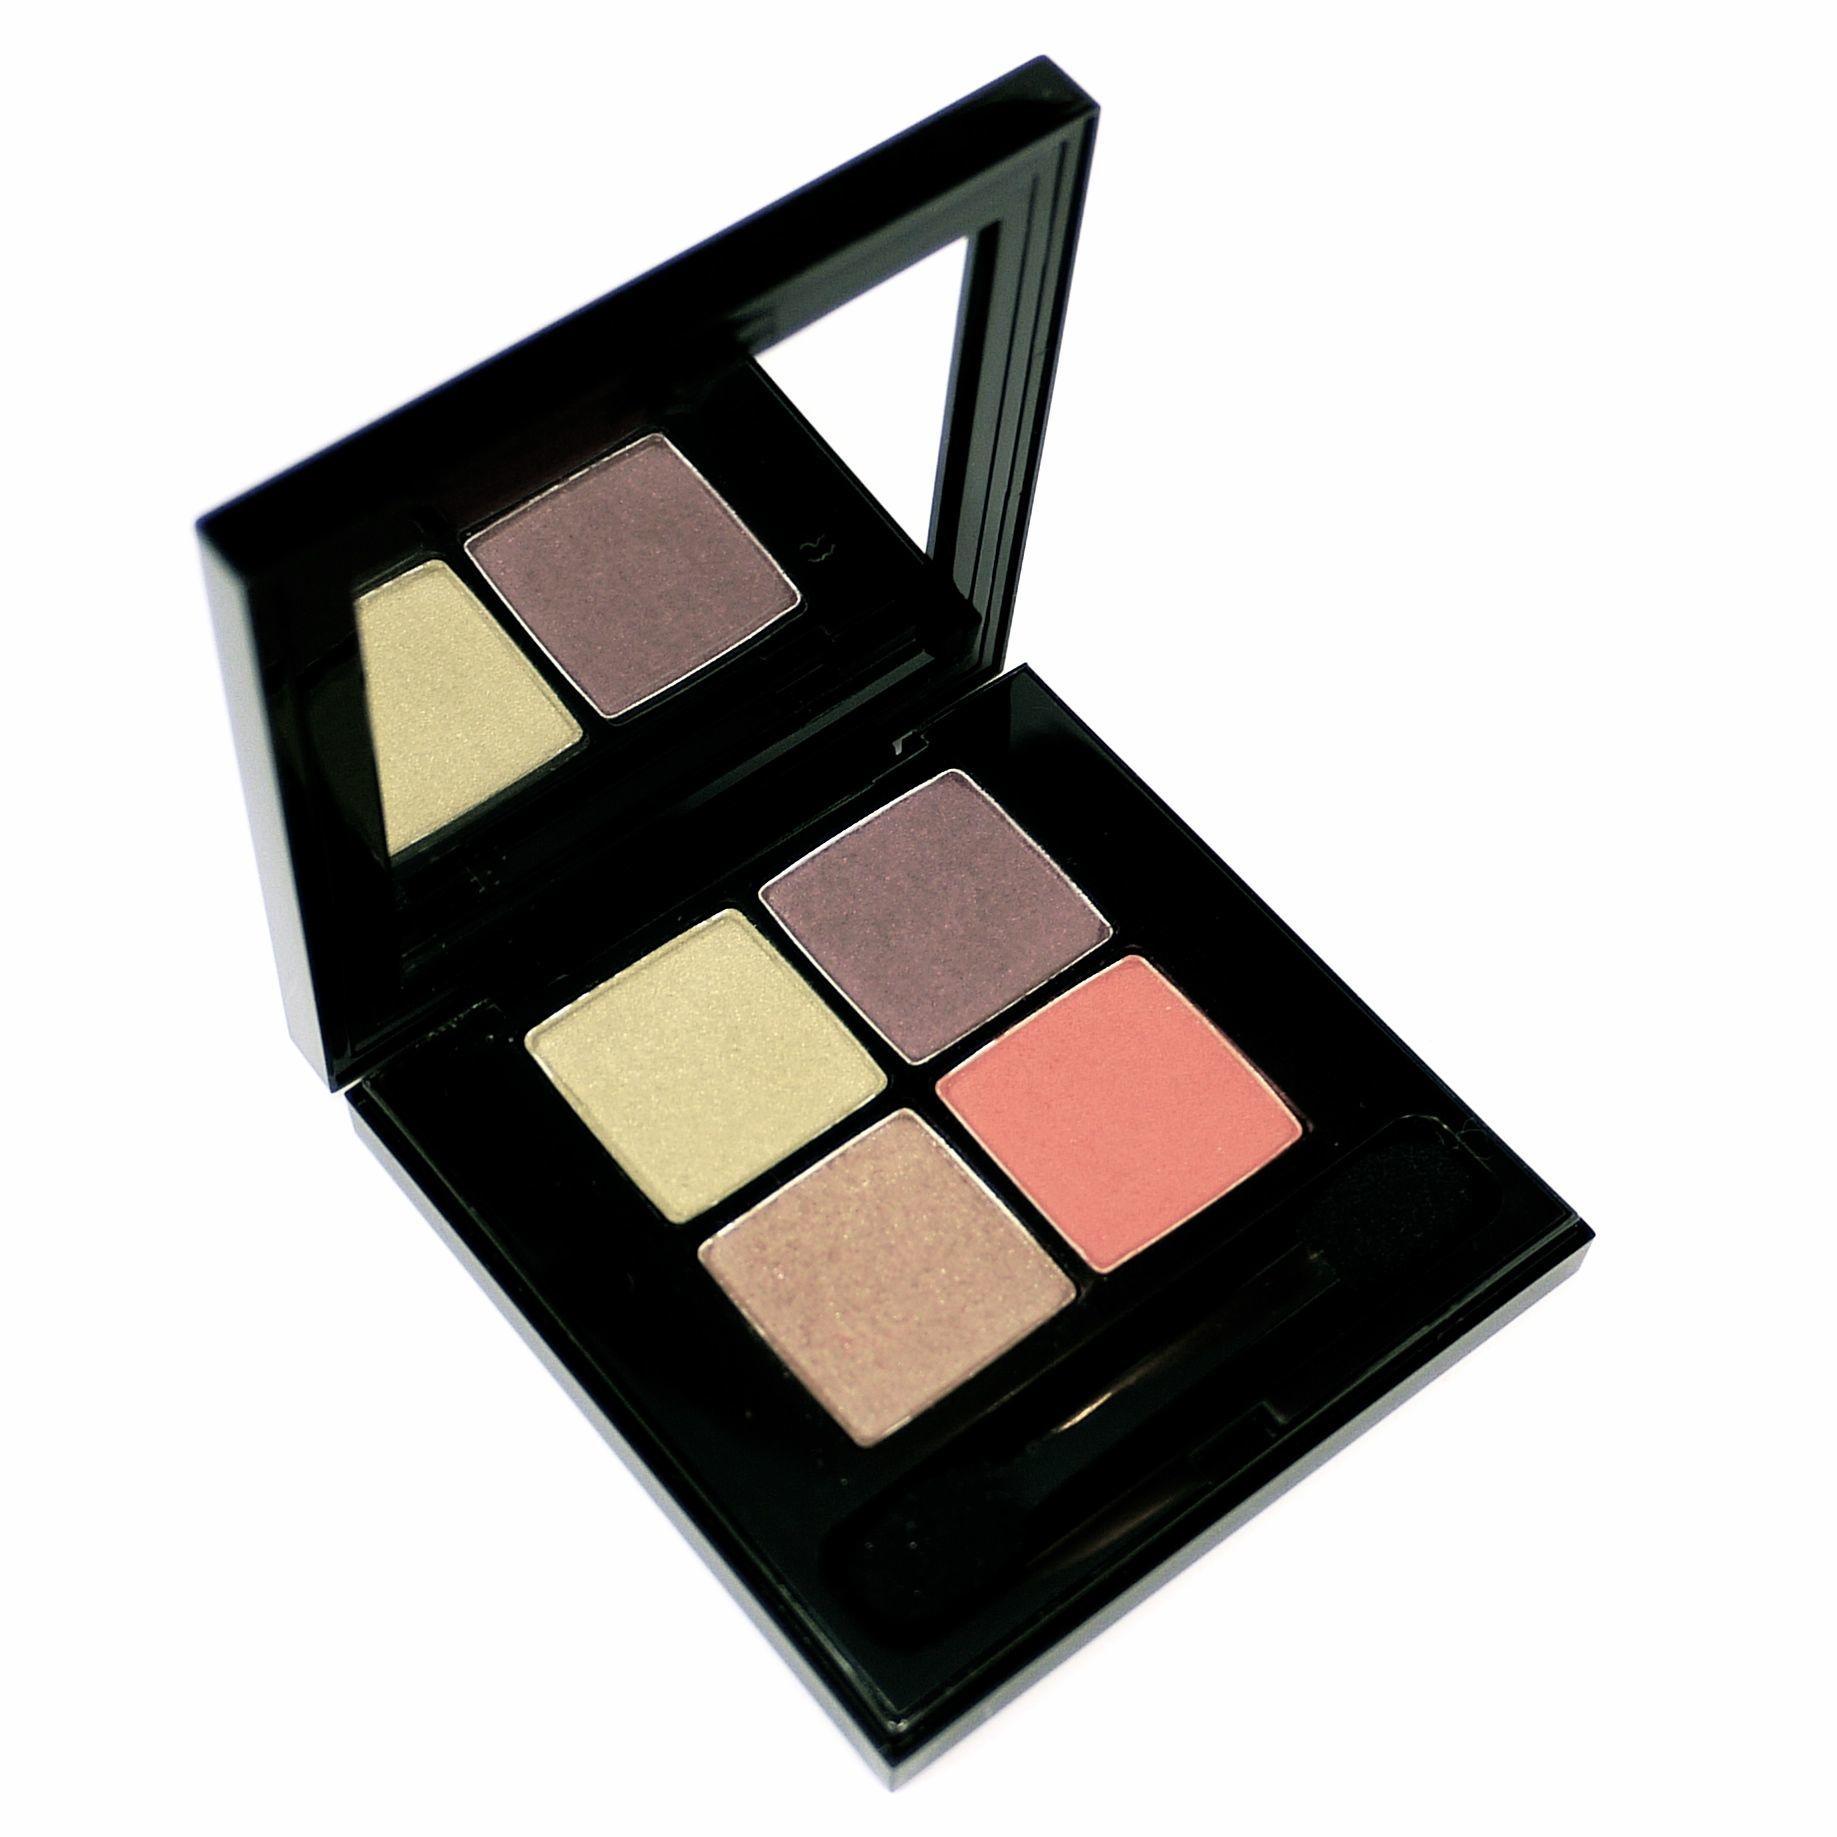 Ysl eyeshadow palette quartet 2 glambot best deals on ysl ysl eyeshadow palette quartet 2 0 ccuart Gallery